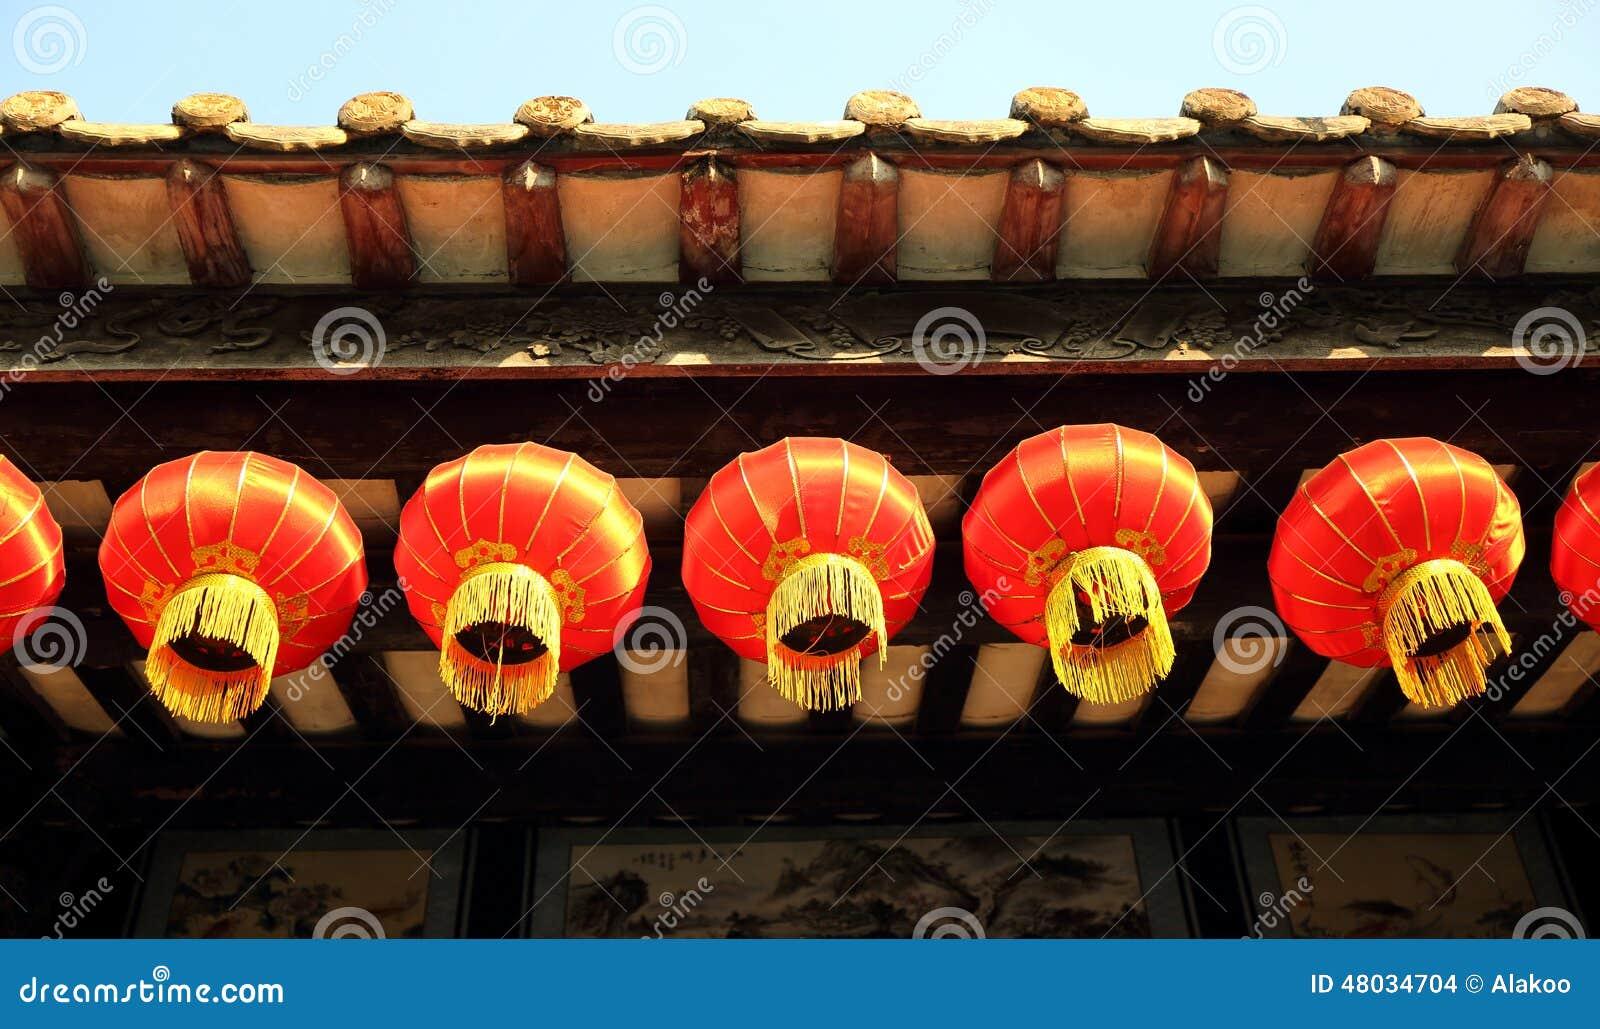 Asian Chinese Red Lantern China Stock Photo Image 48034704